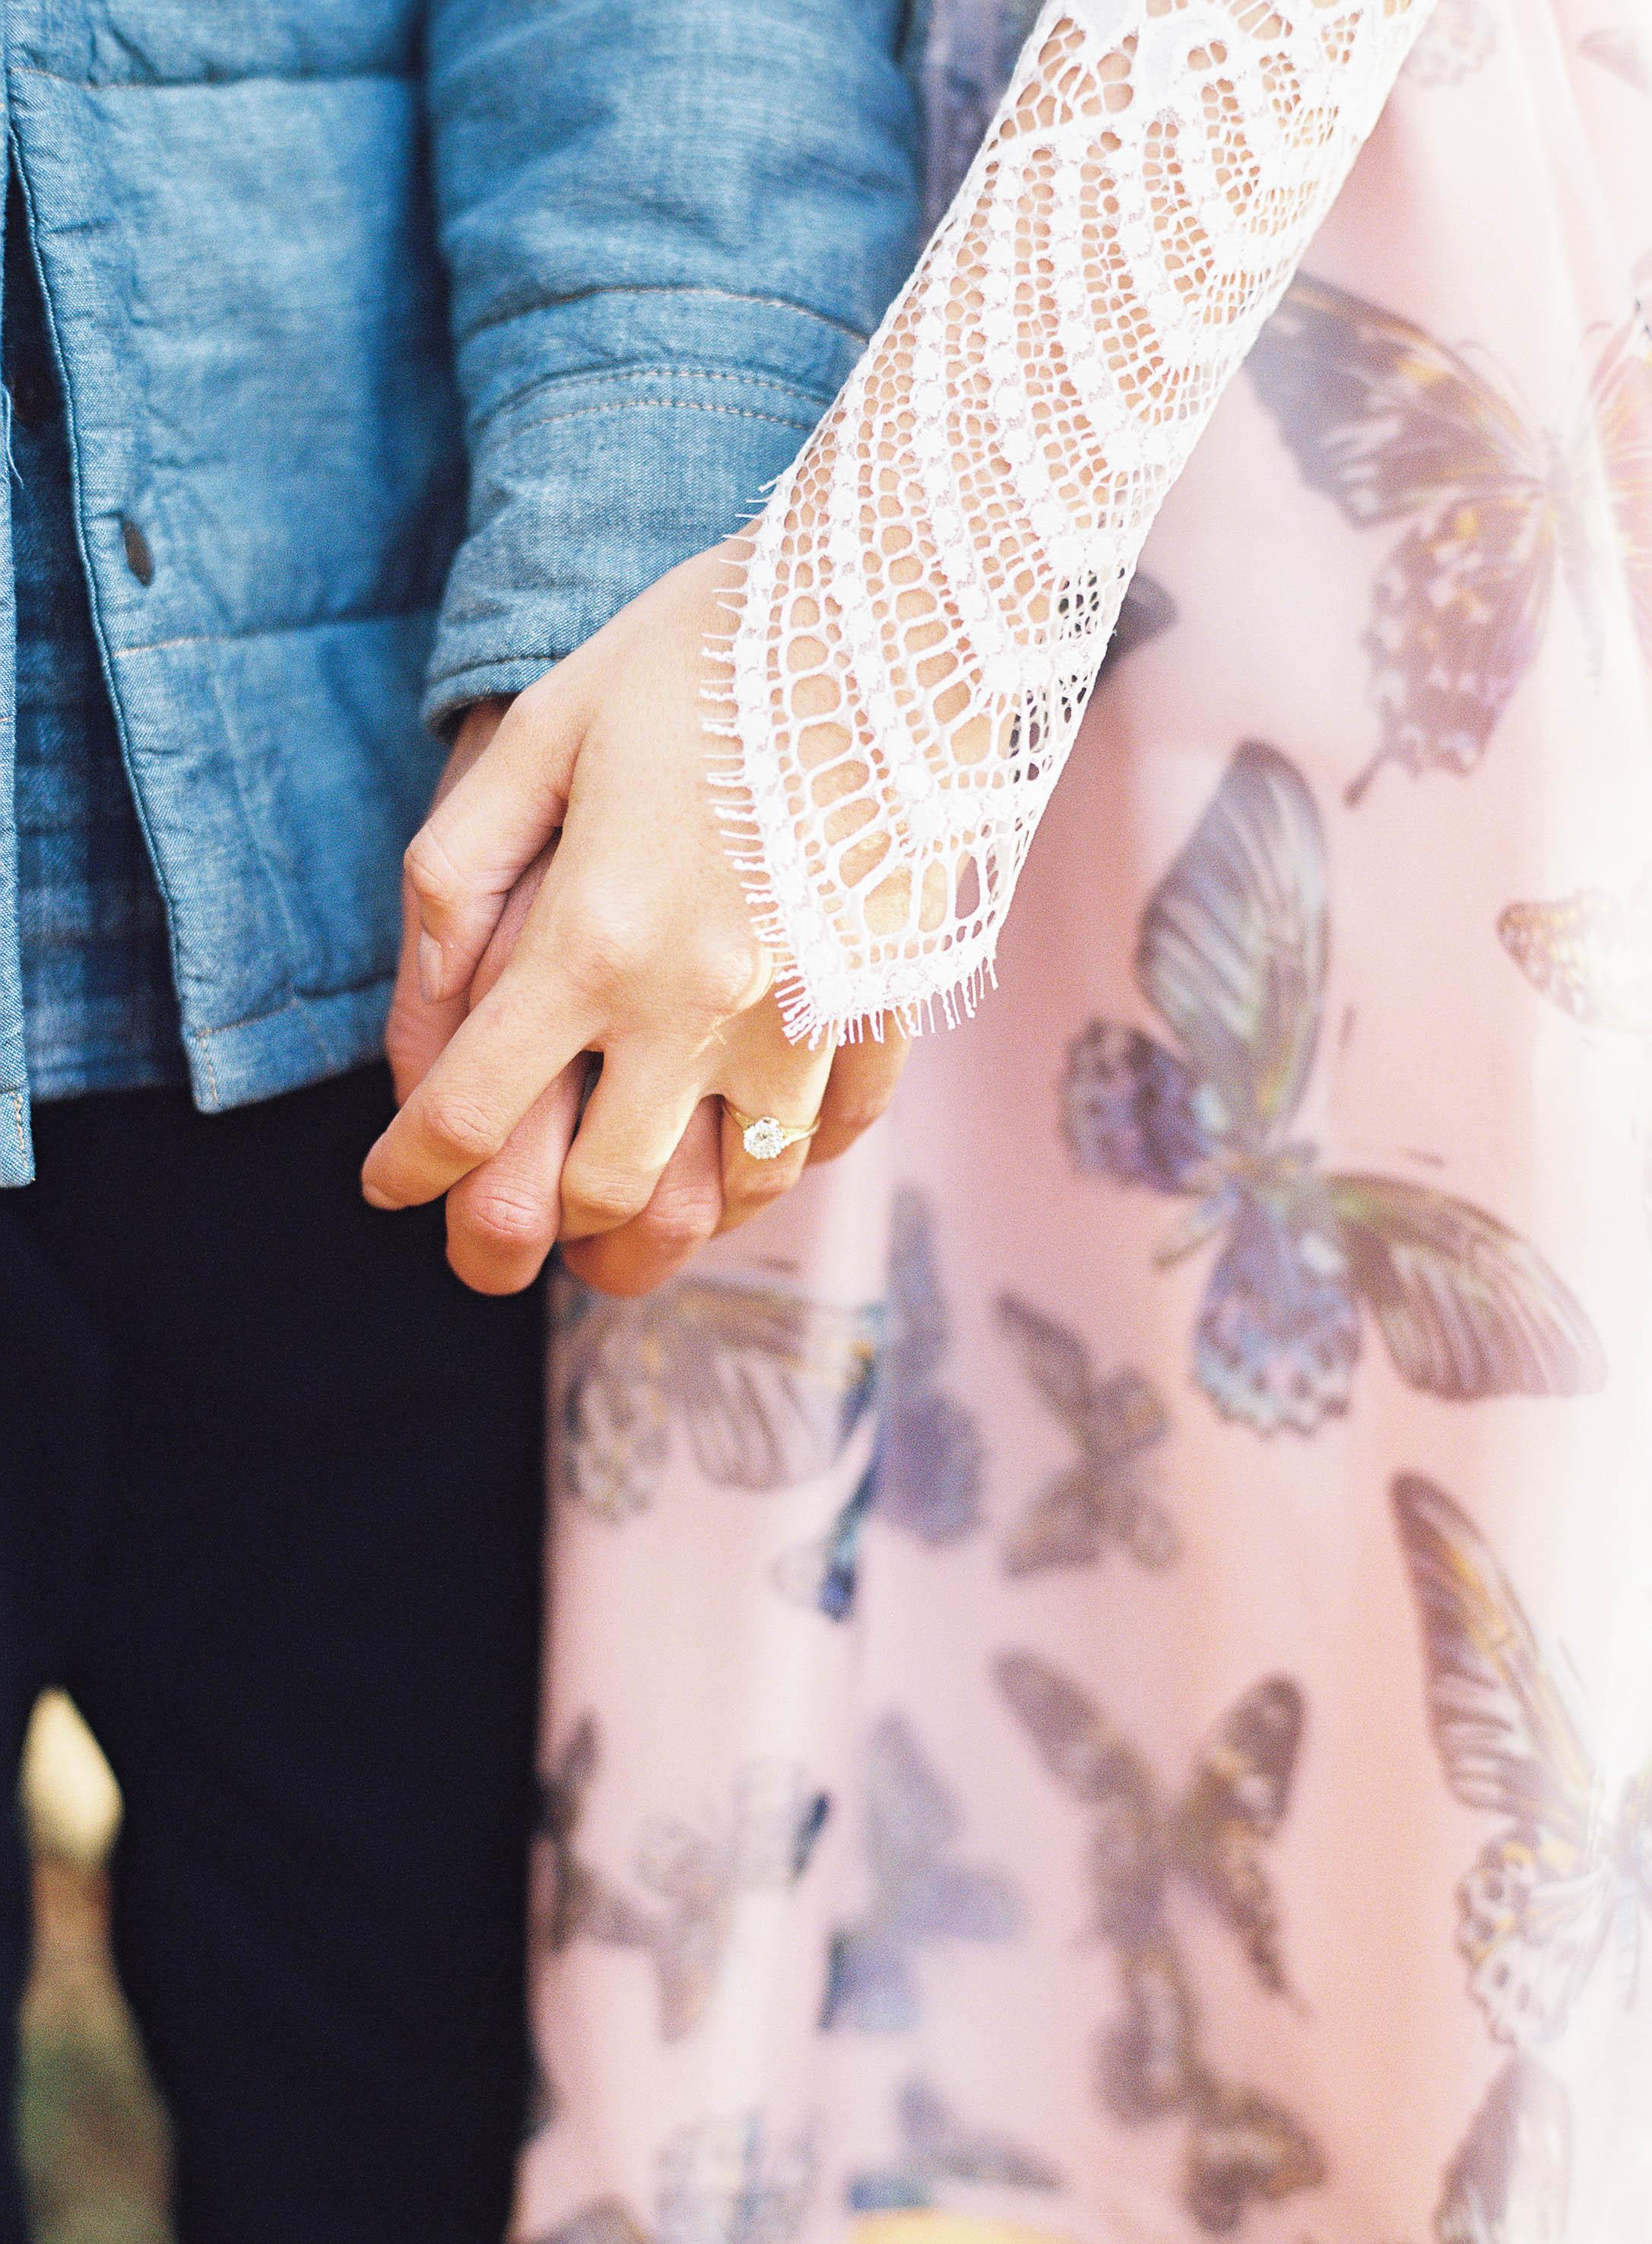 Meghan Mehan Photography - Fine Art Film Wedding Photography - San Francisco | Napa | Sonoma | Big Sur | Chicago | Minneapolis | Milwaukee | Lake Geneva | Door County | Wisconsin 033.jpg